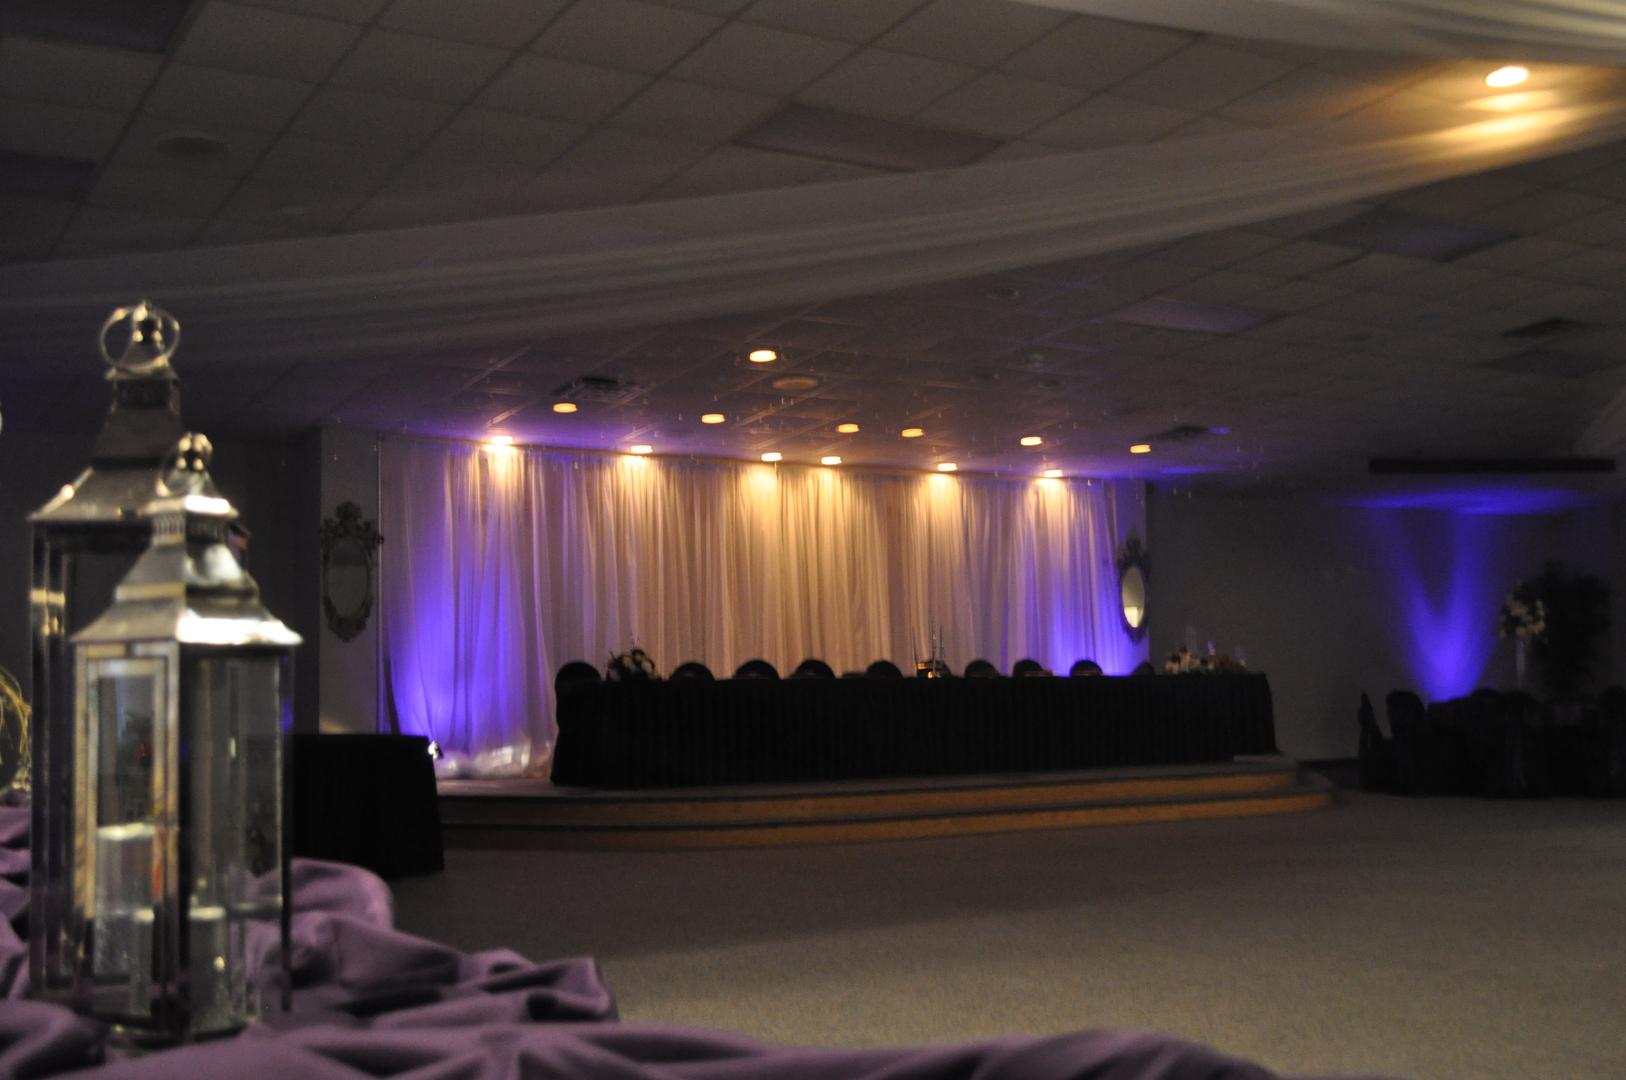 Ridgemont Ballroom Wedding Reception Venues Banquet Hall Rental